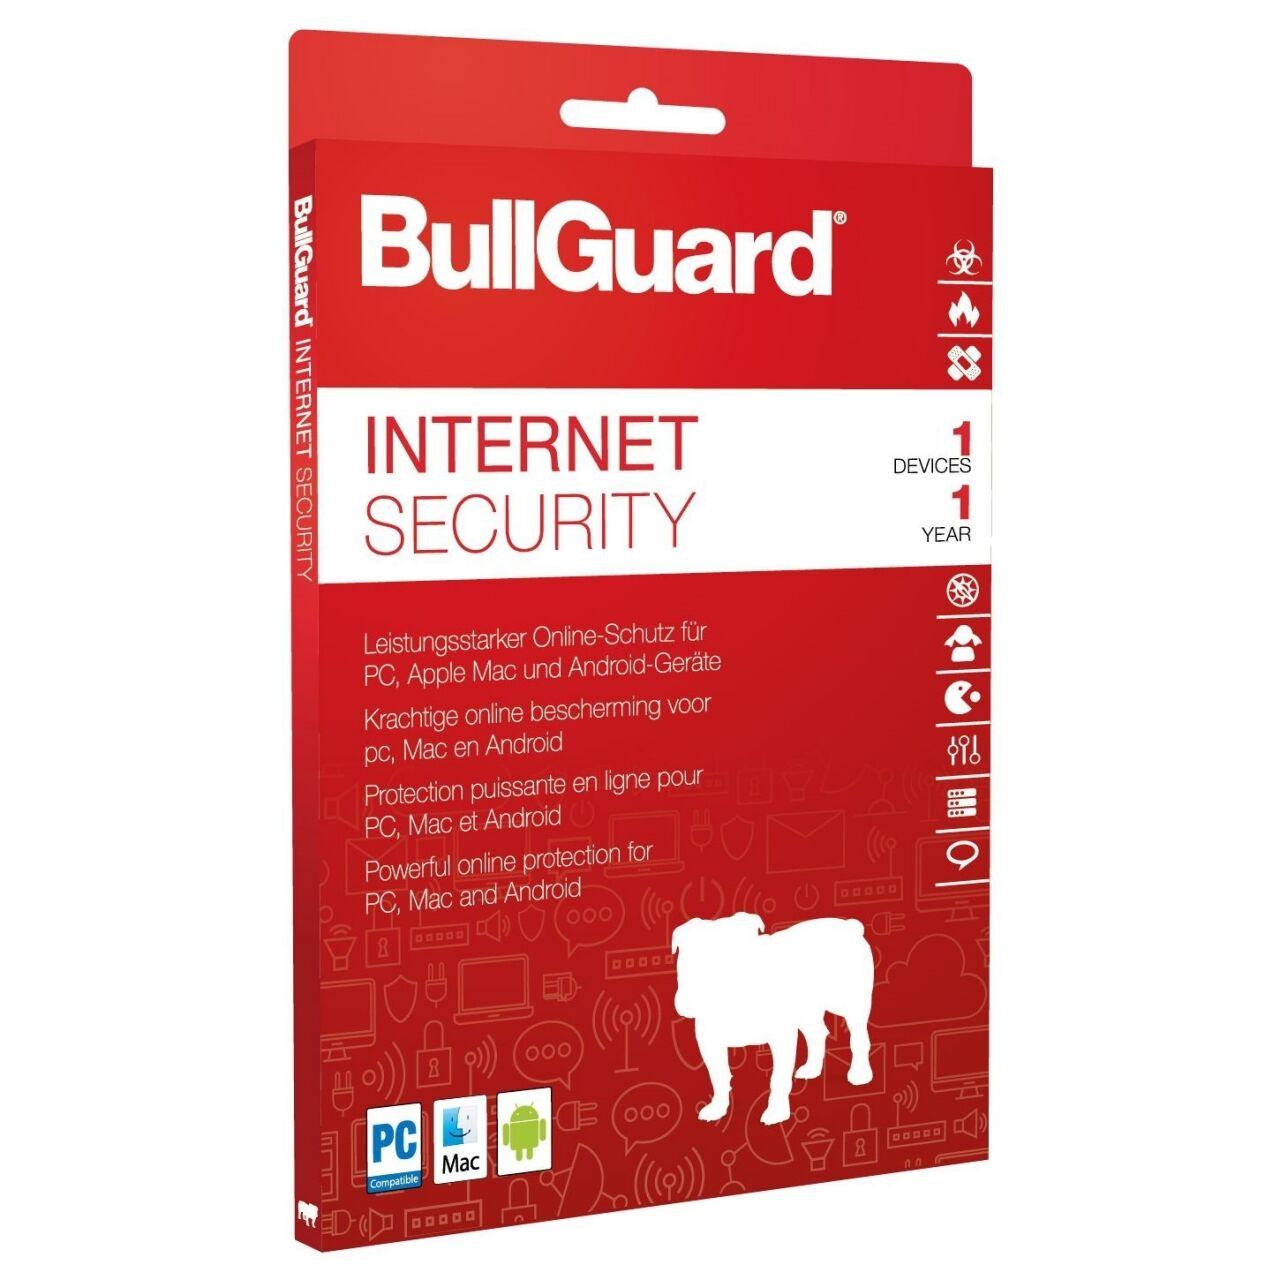 BullGuard Internet Security 2020 version complète 1 Année 1 Appareil